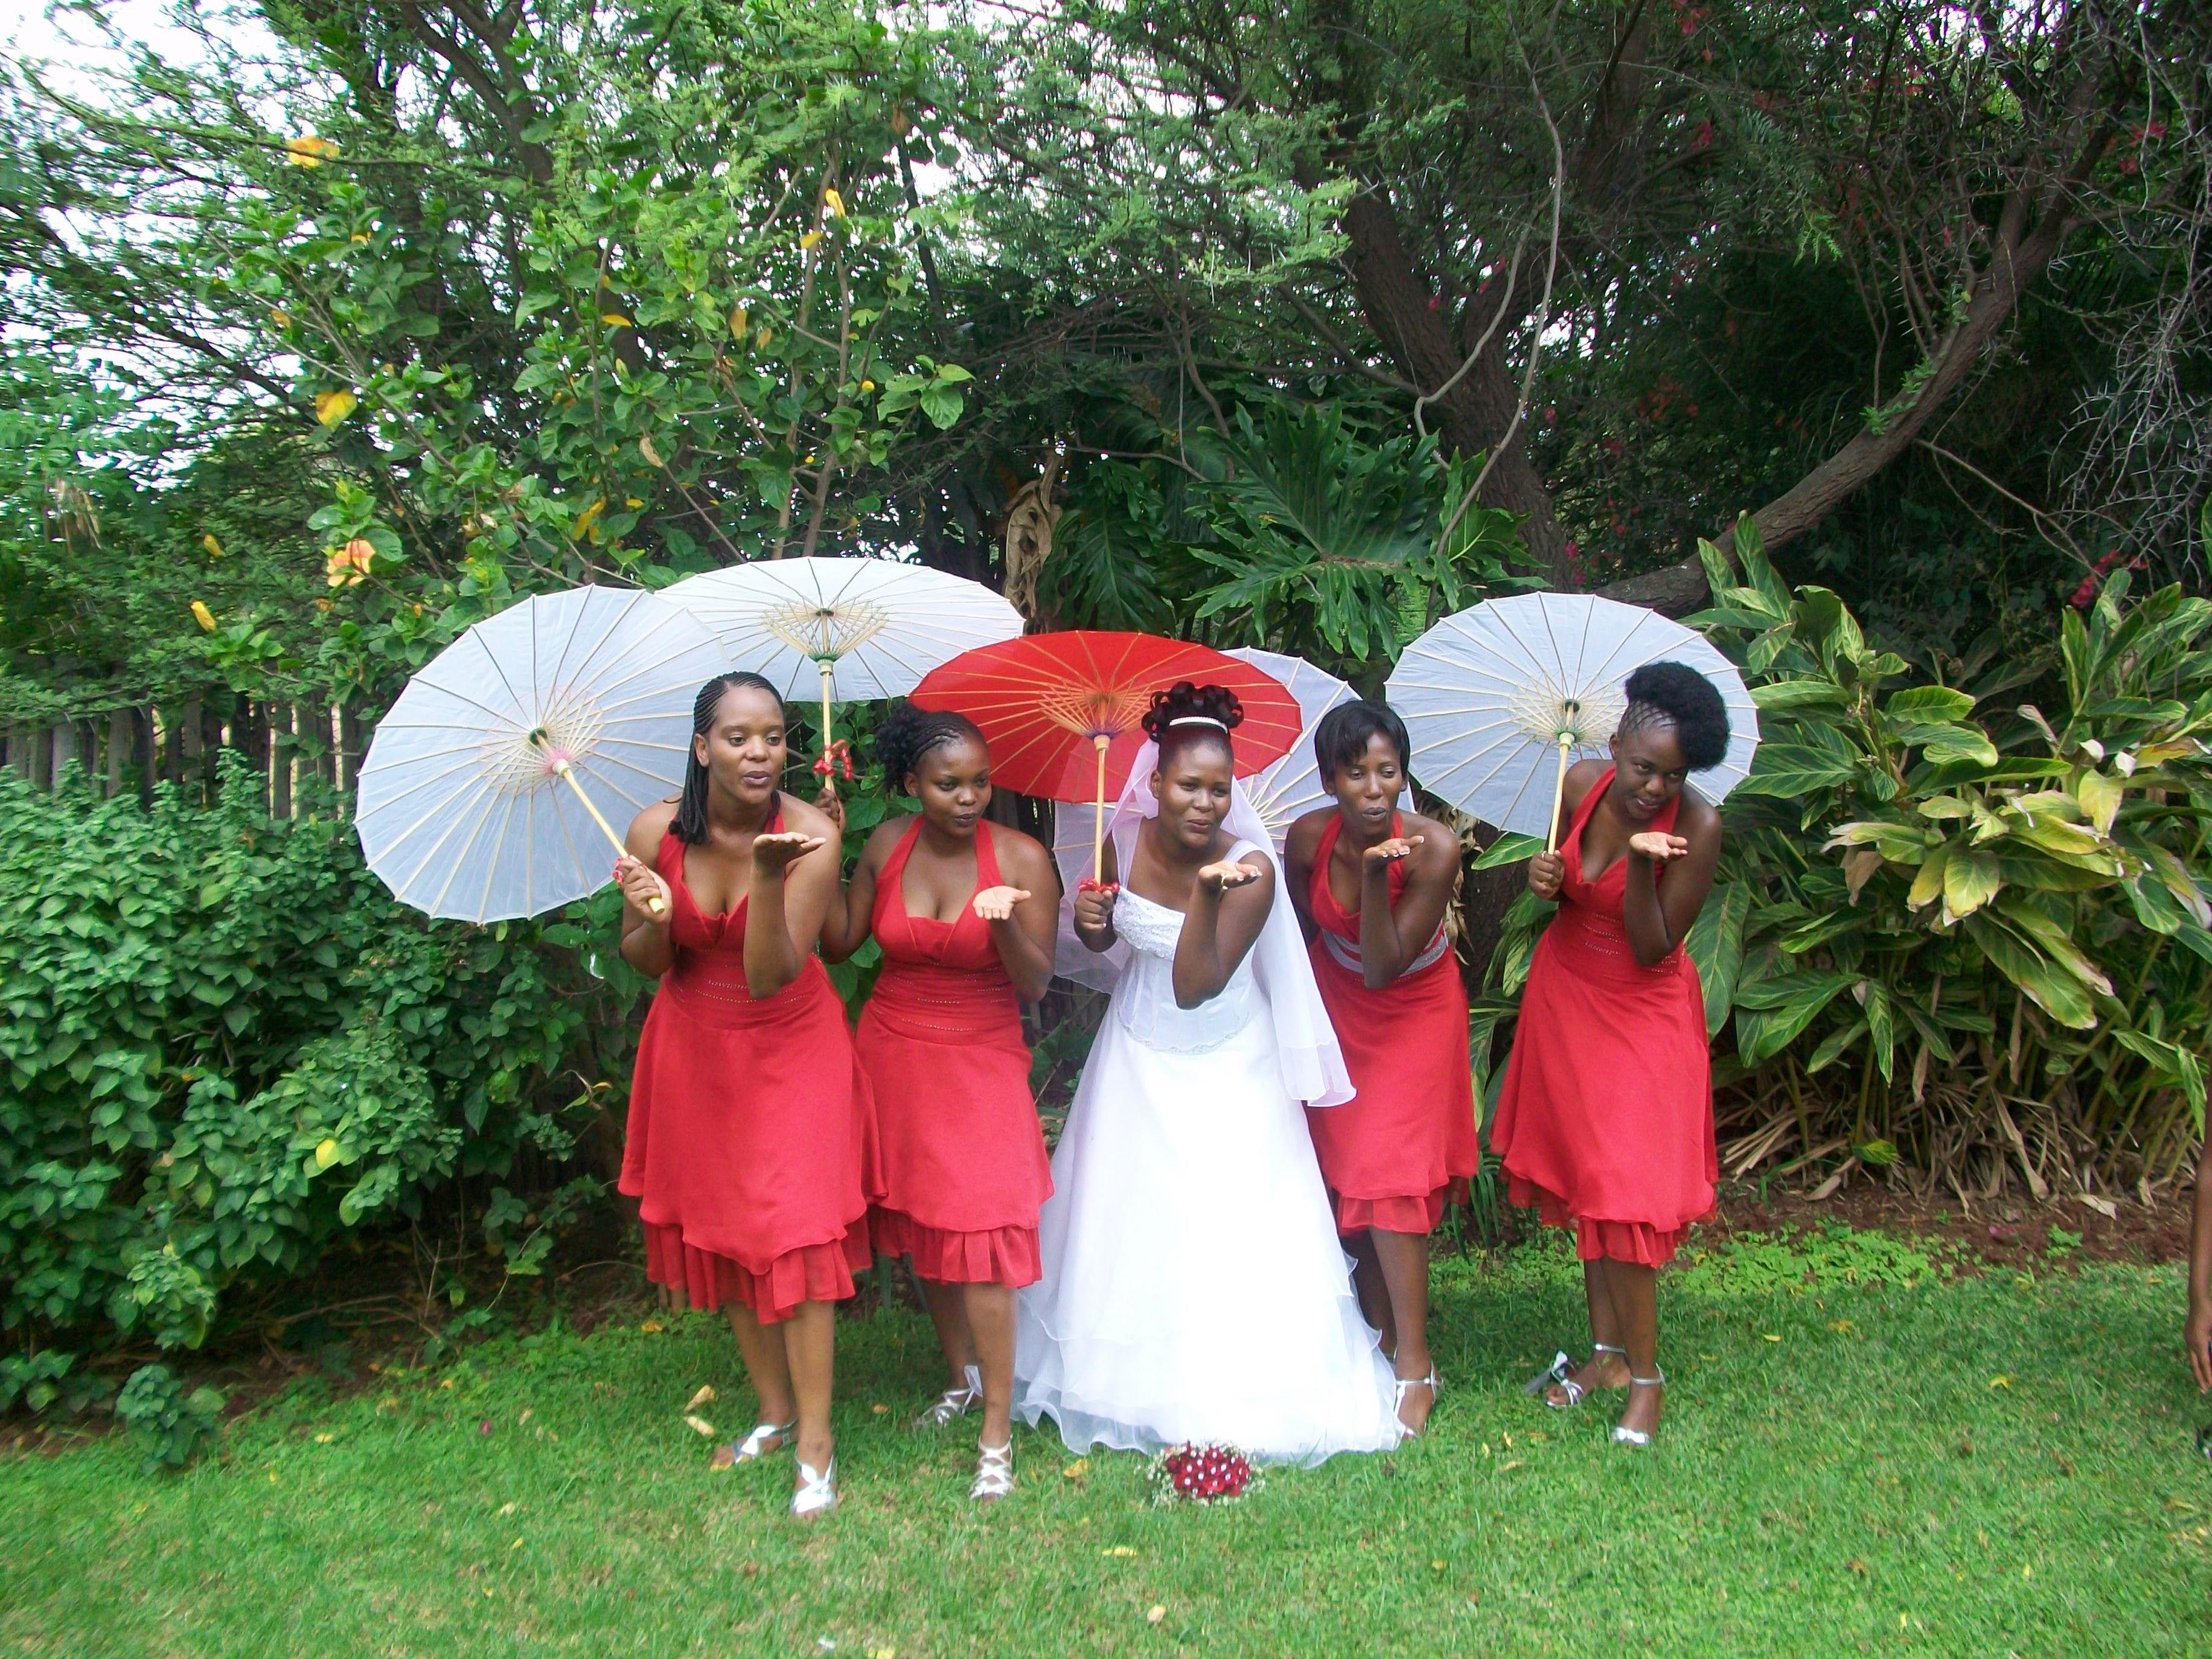 Bridesmaids, Bridesmaids Dresses, Fashion, red, Parasols